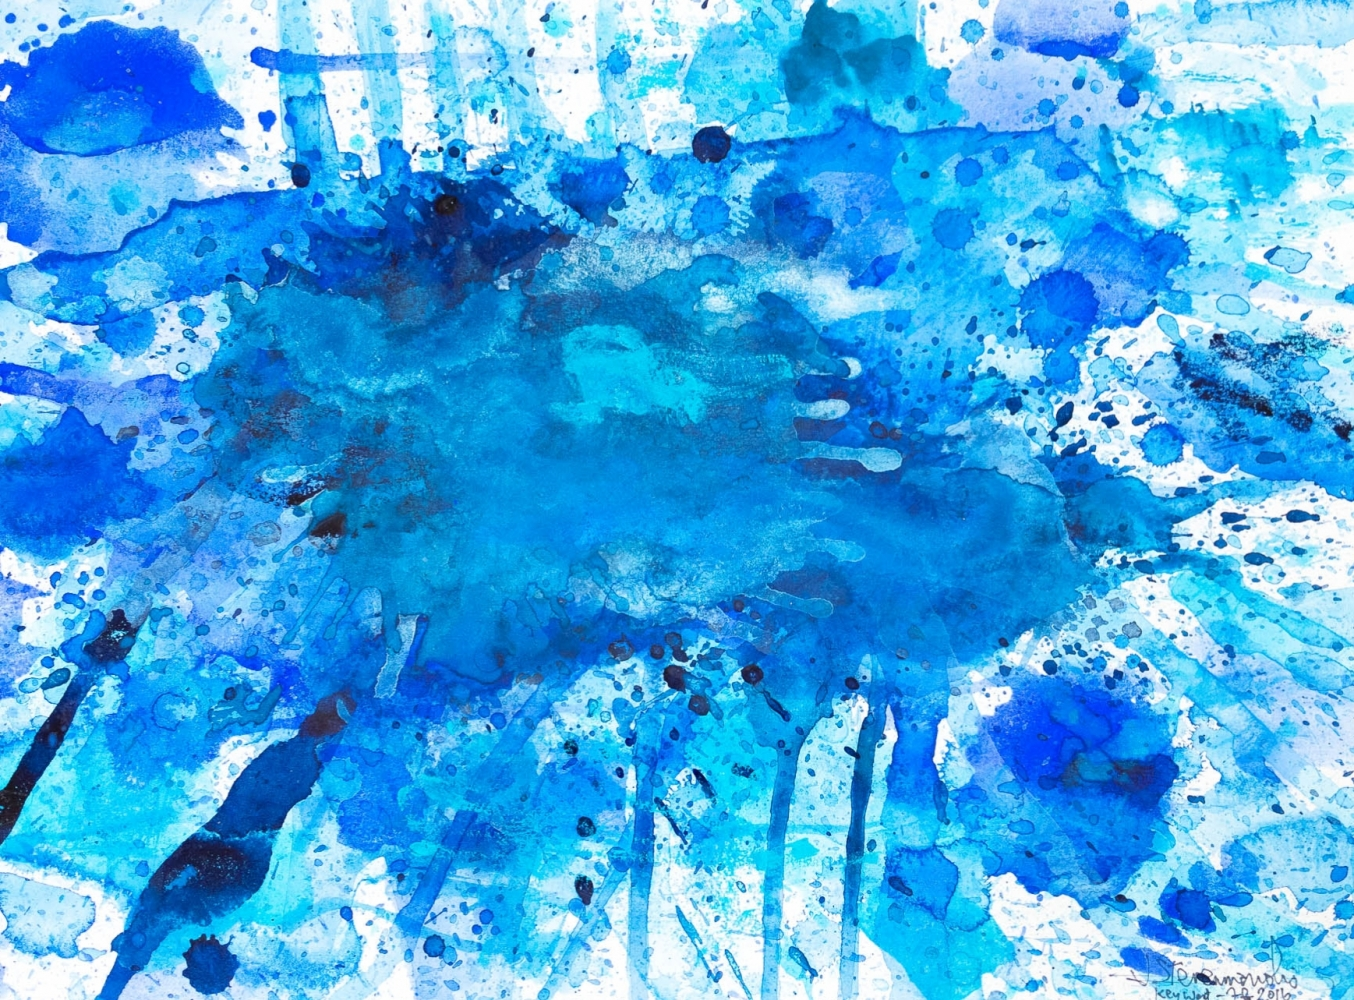 J. Steven Manolis, Splash-Key West (12.16.05), 2016, Watercolor, Acrylic and Gouache on paper, 12 x 16 inches, blue abstract watercolor, abstract expressionism art